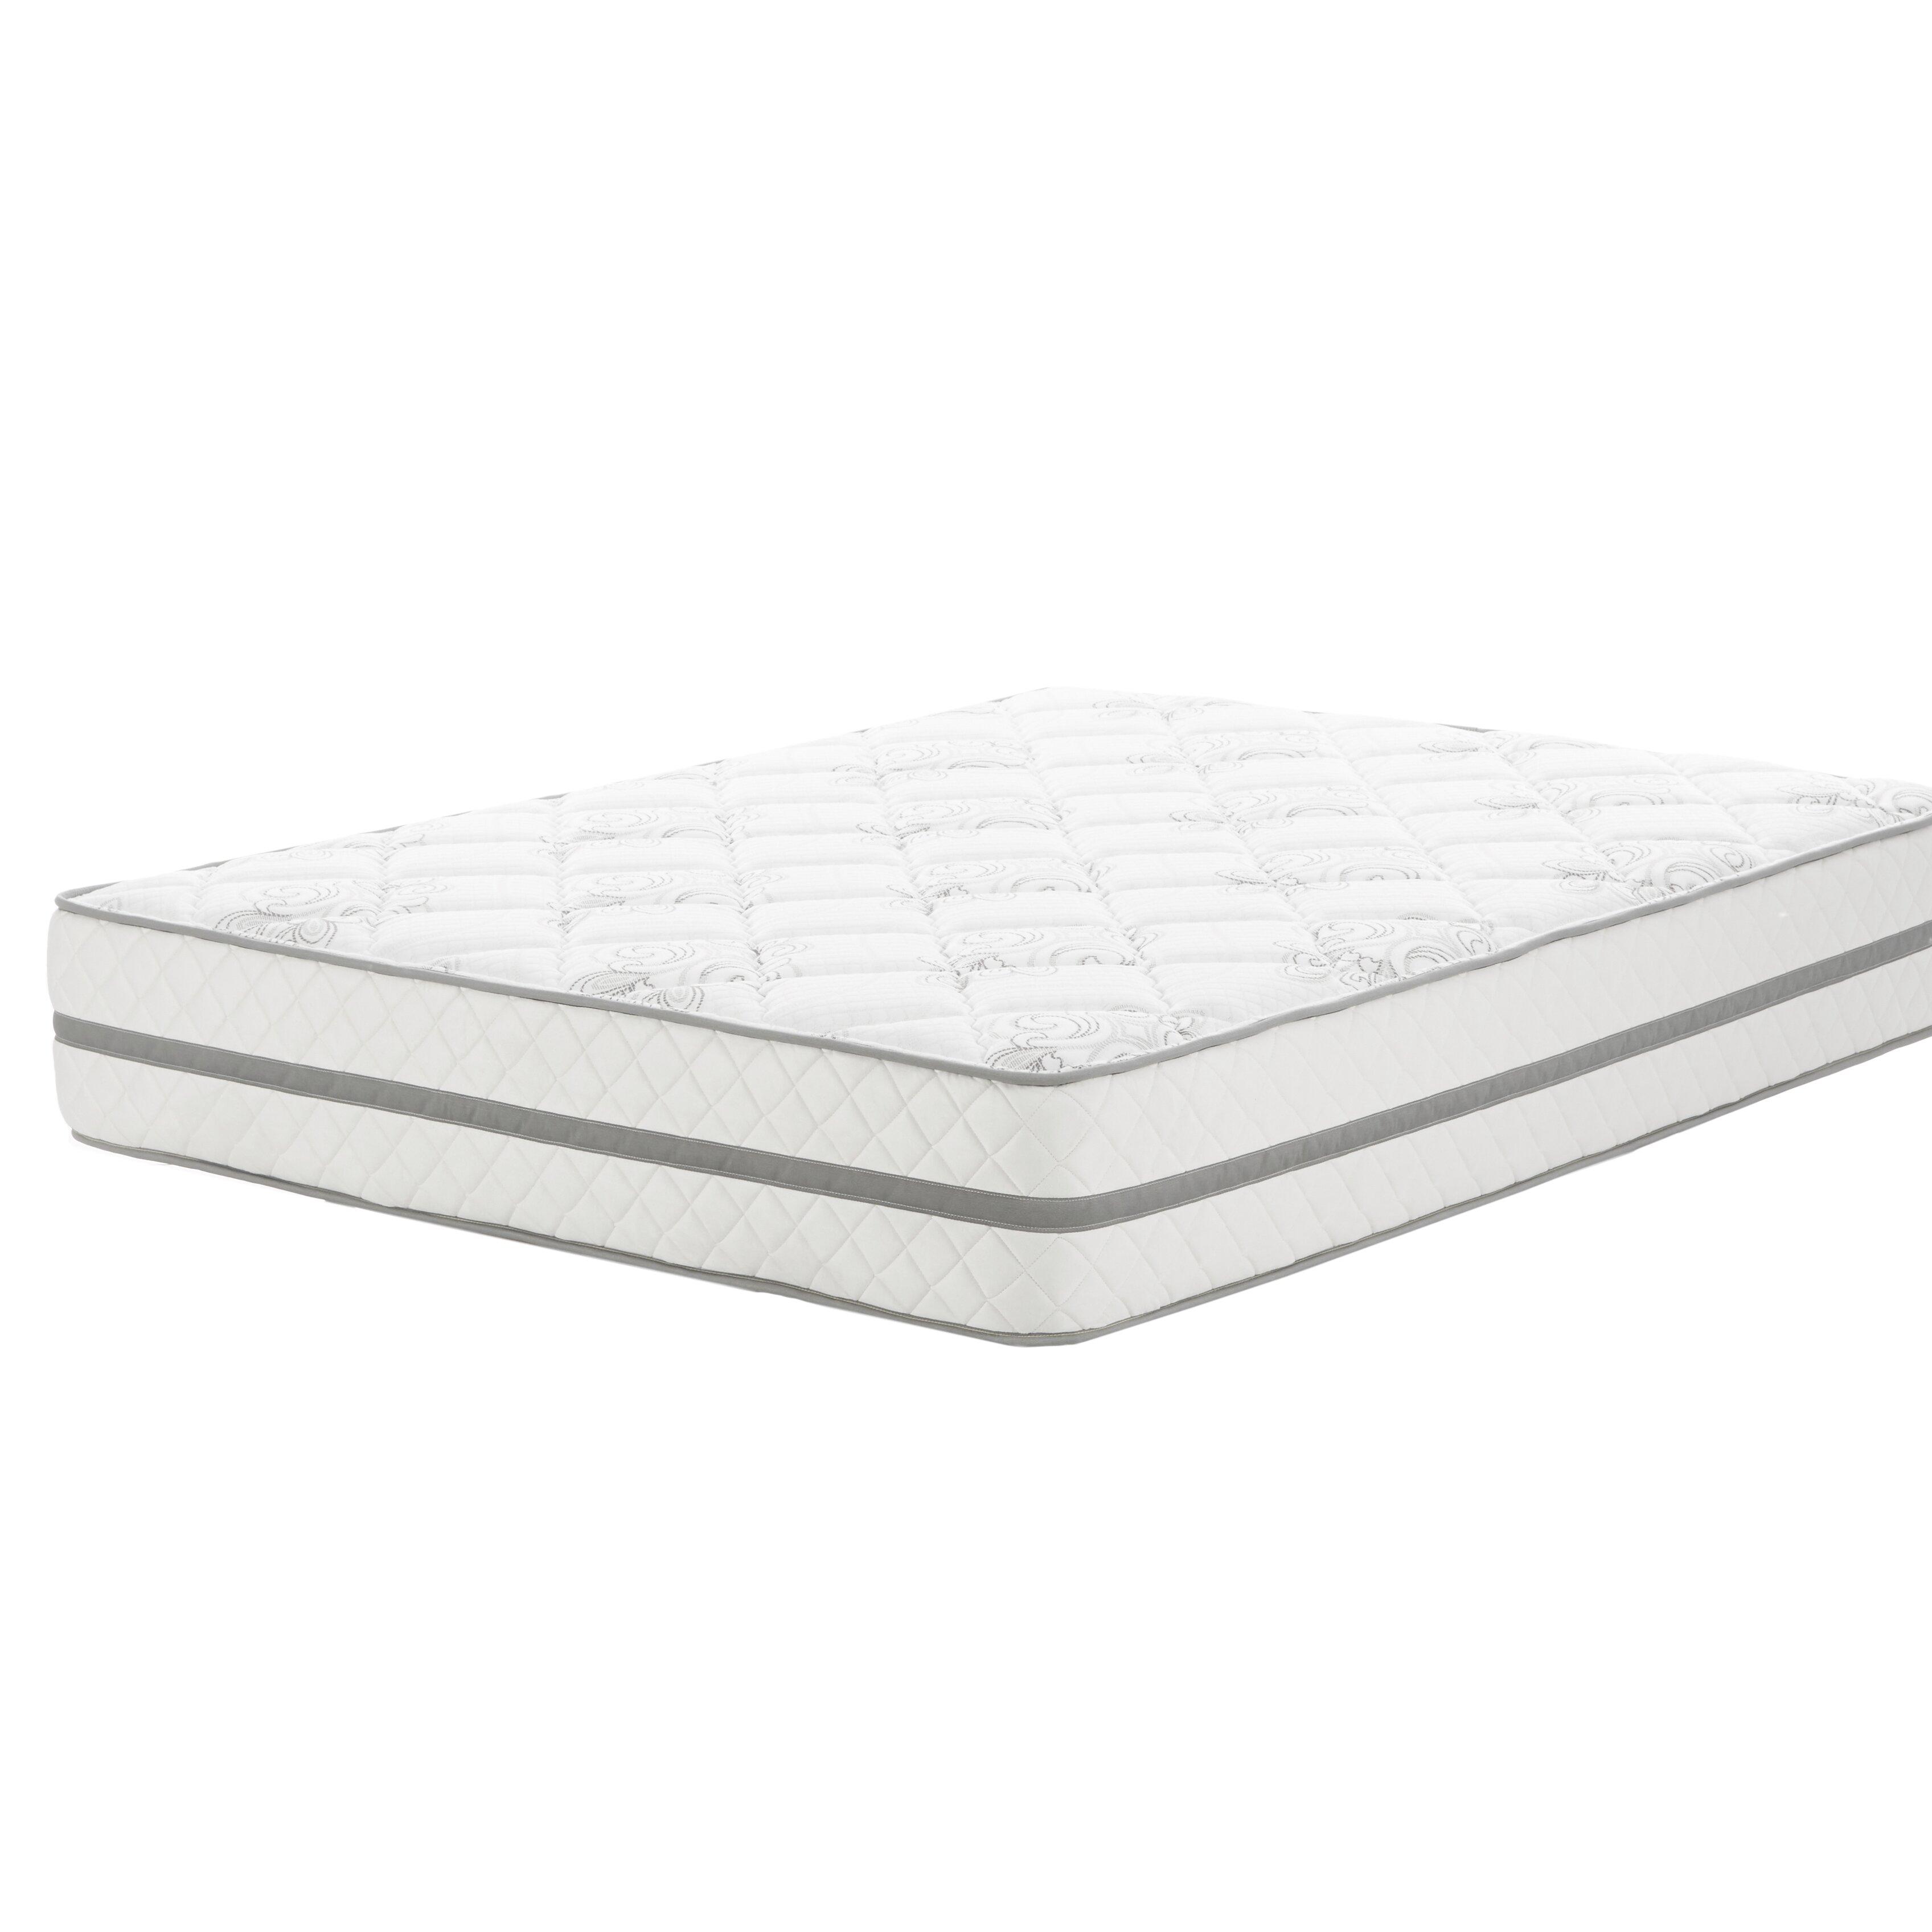 wayfair sleep wayfair sleep 12 plush innerspring mattress